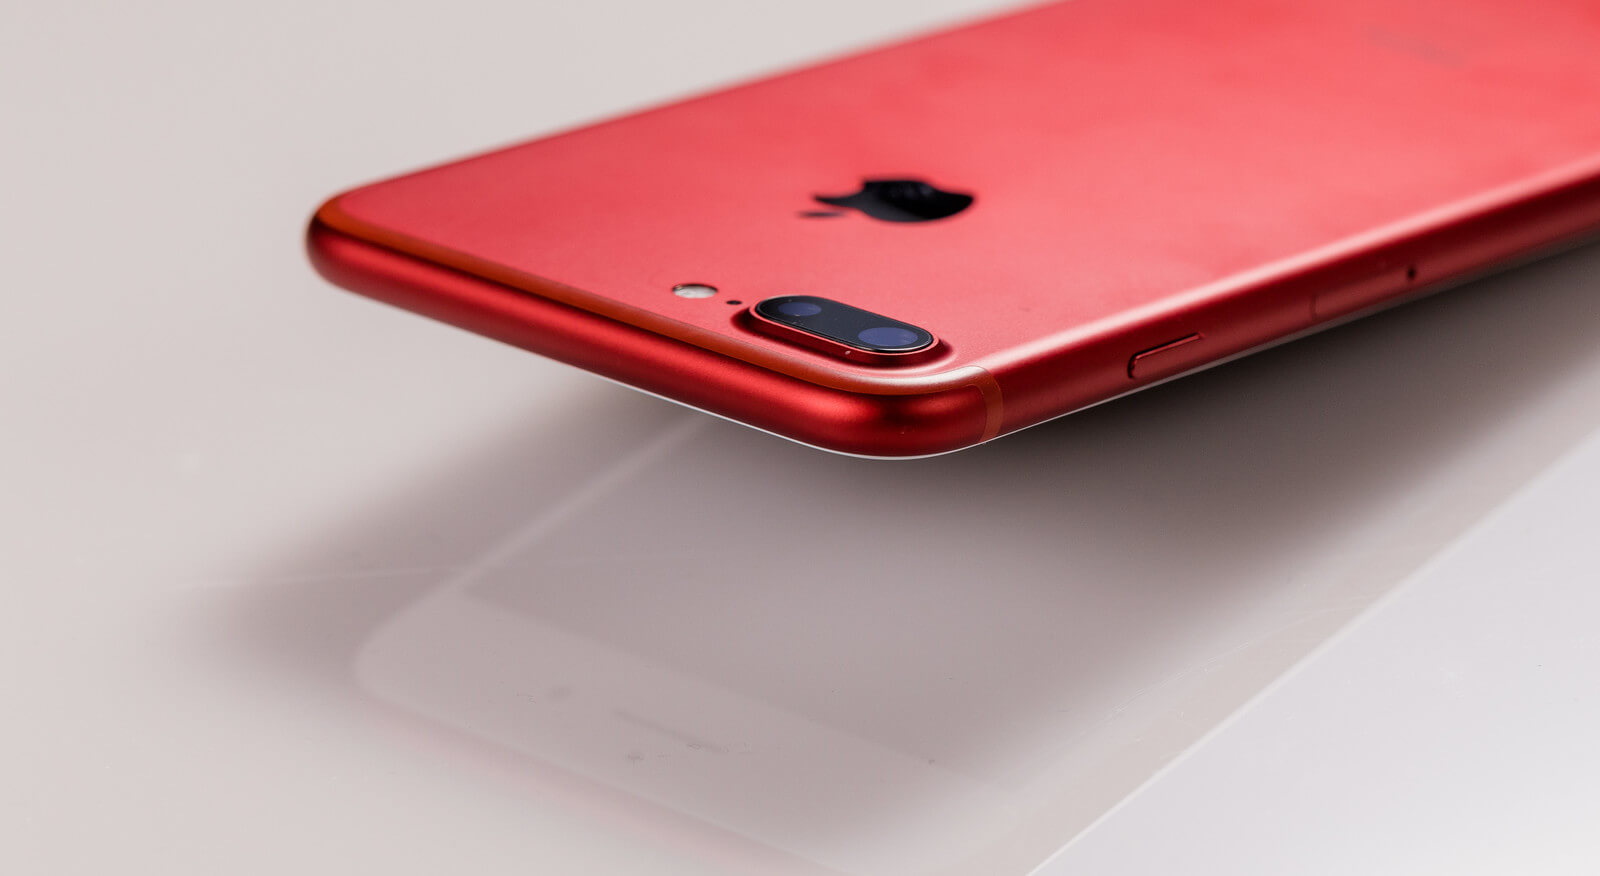 SIMロック解除(SIMフリー化)したauのiPhone